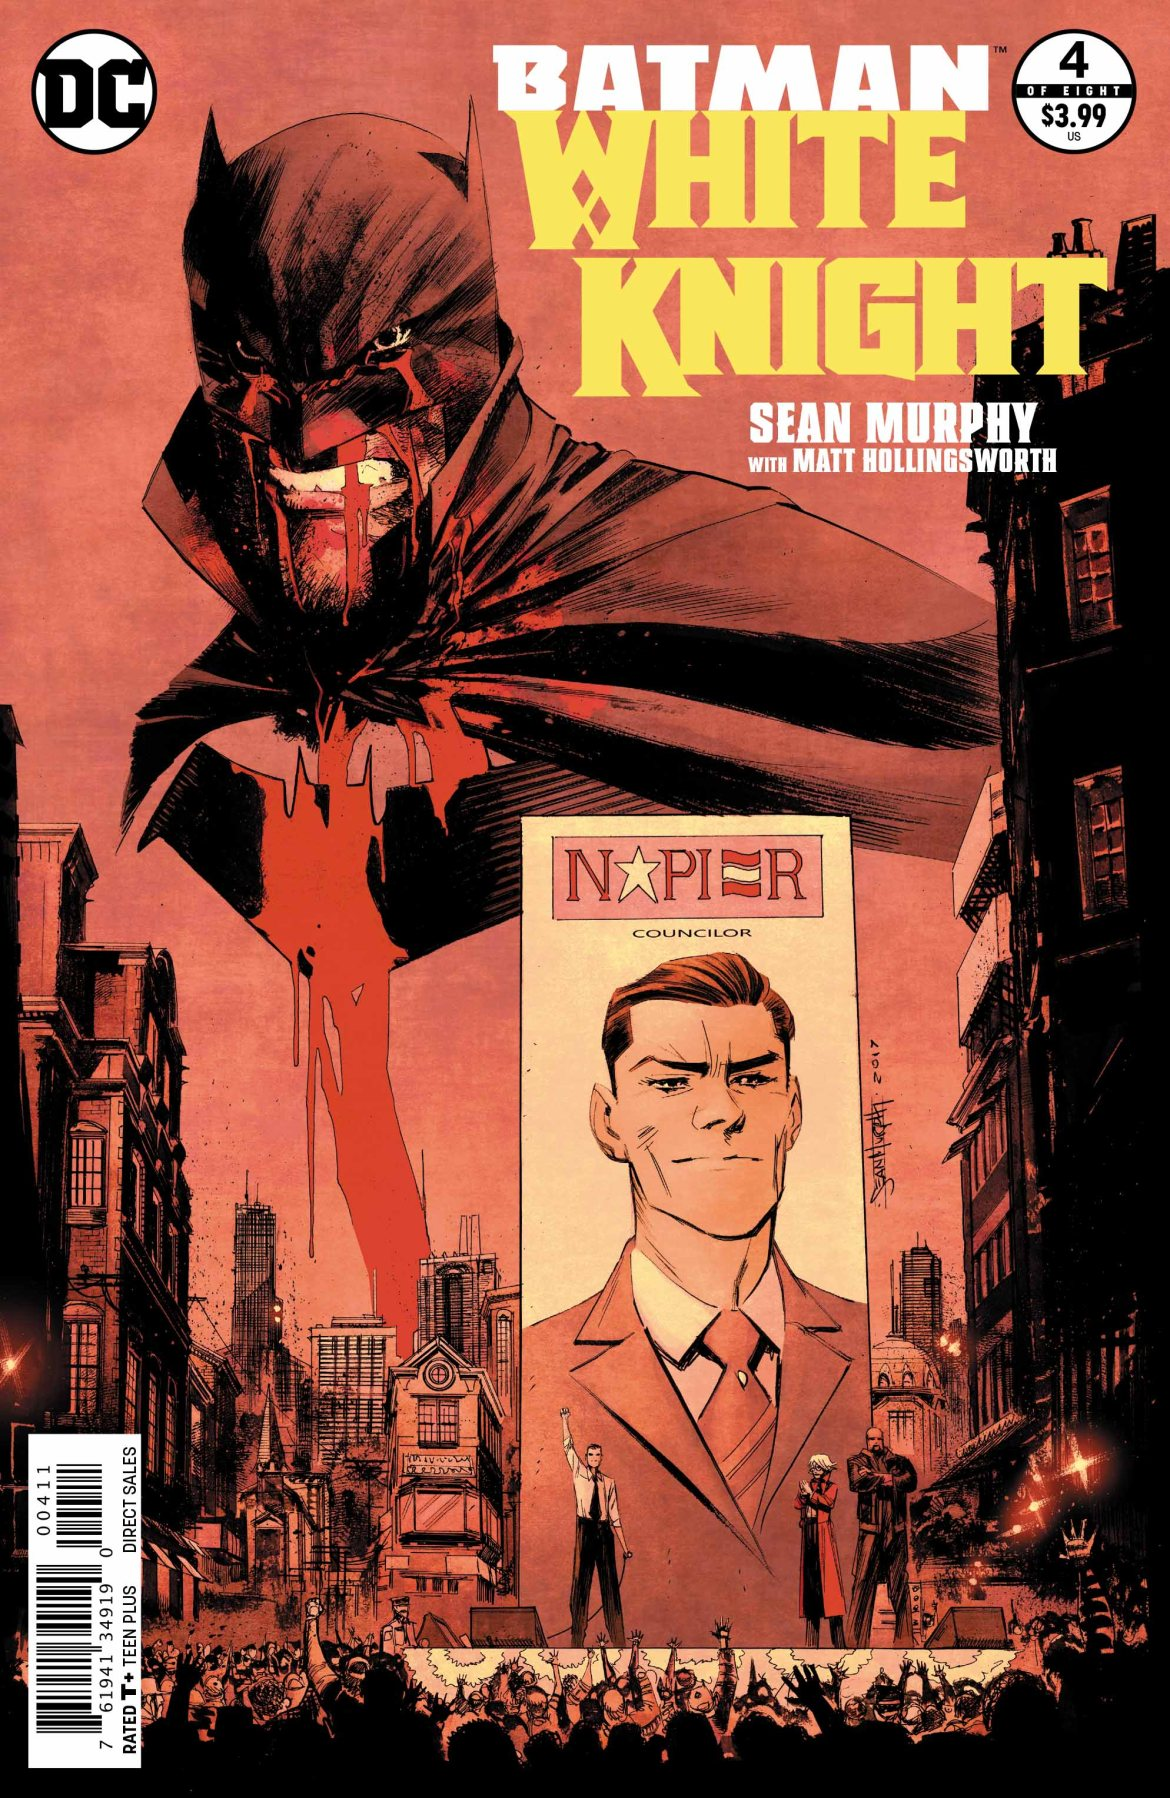 Batman White Knight #4 - DC Comics News